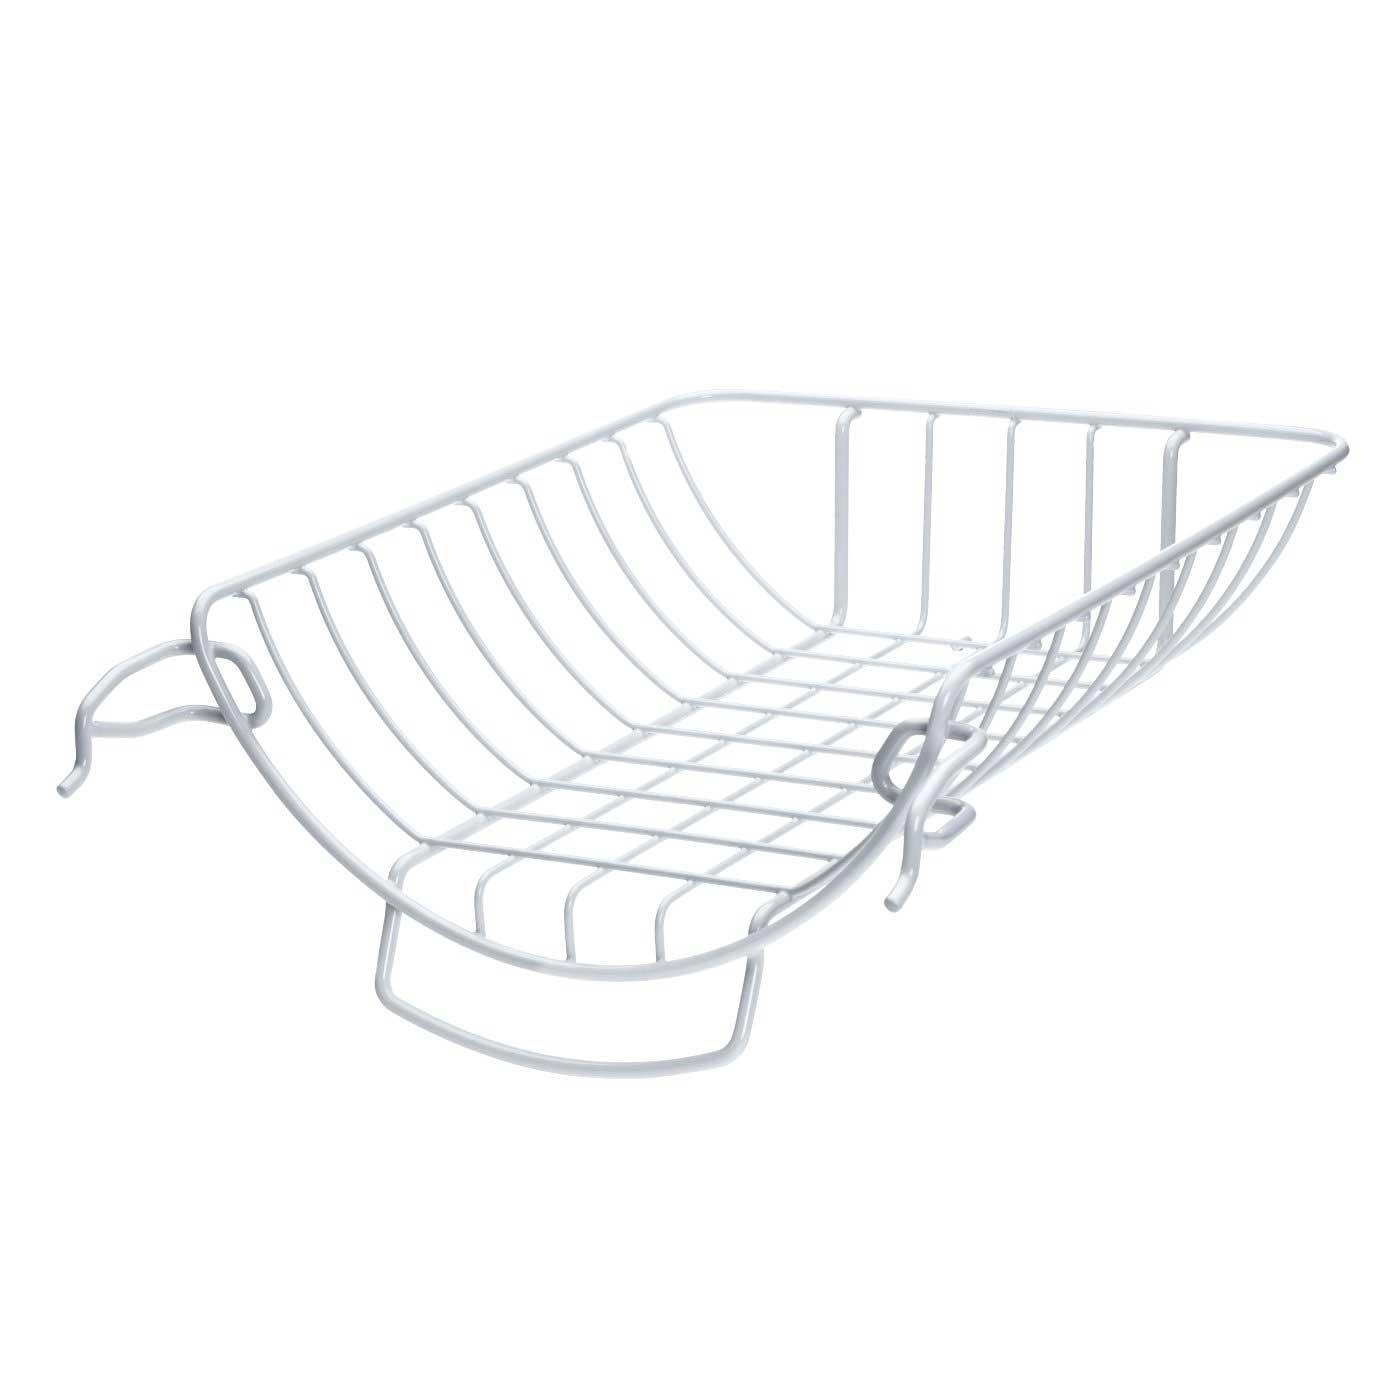 Miele Tumble dryer basket TRK555q